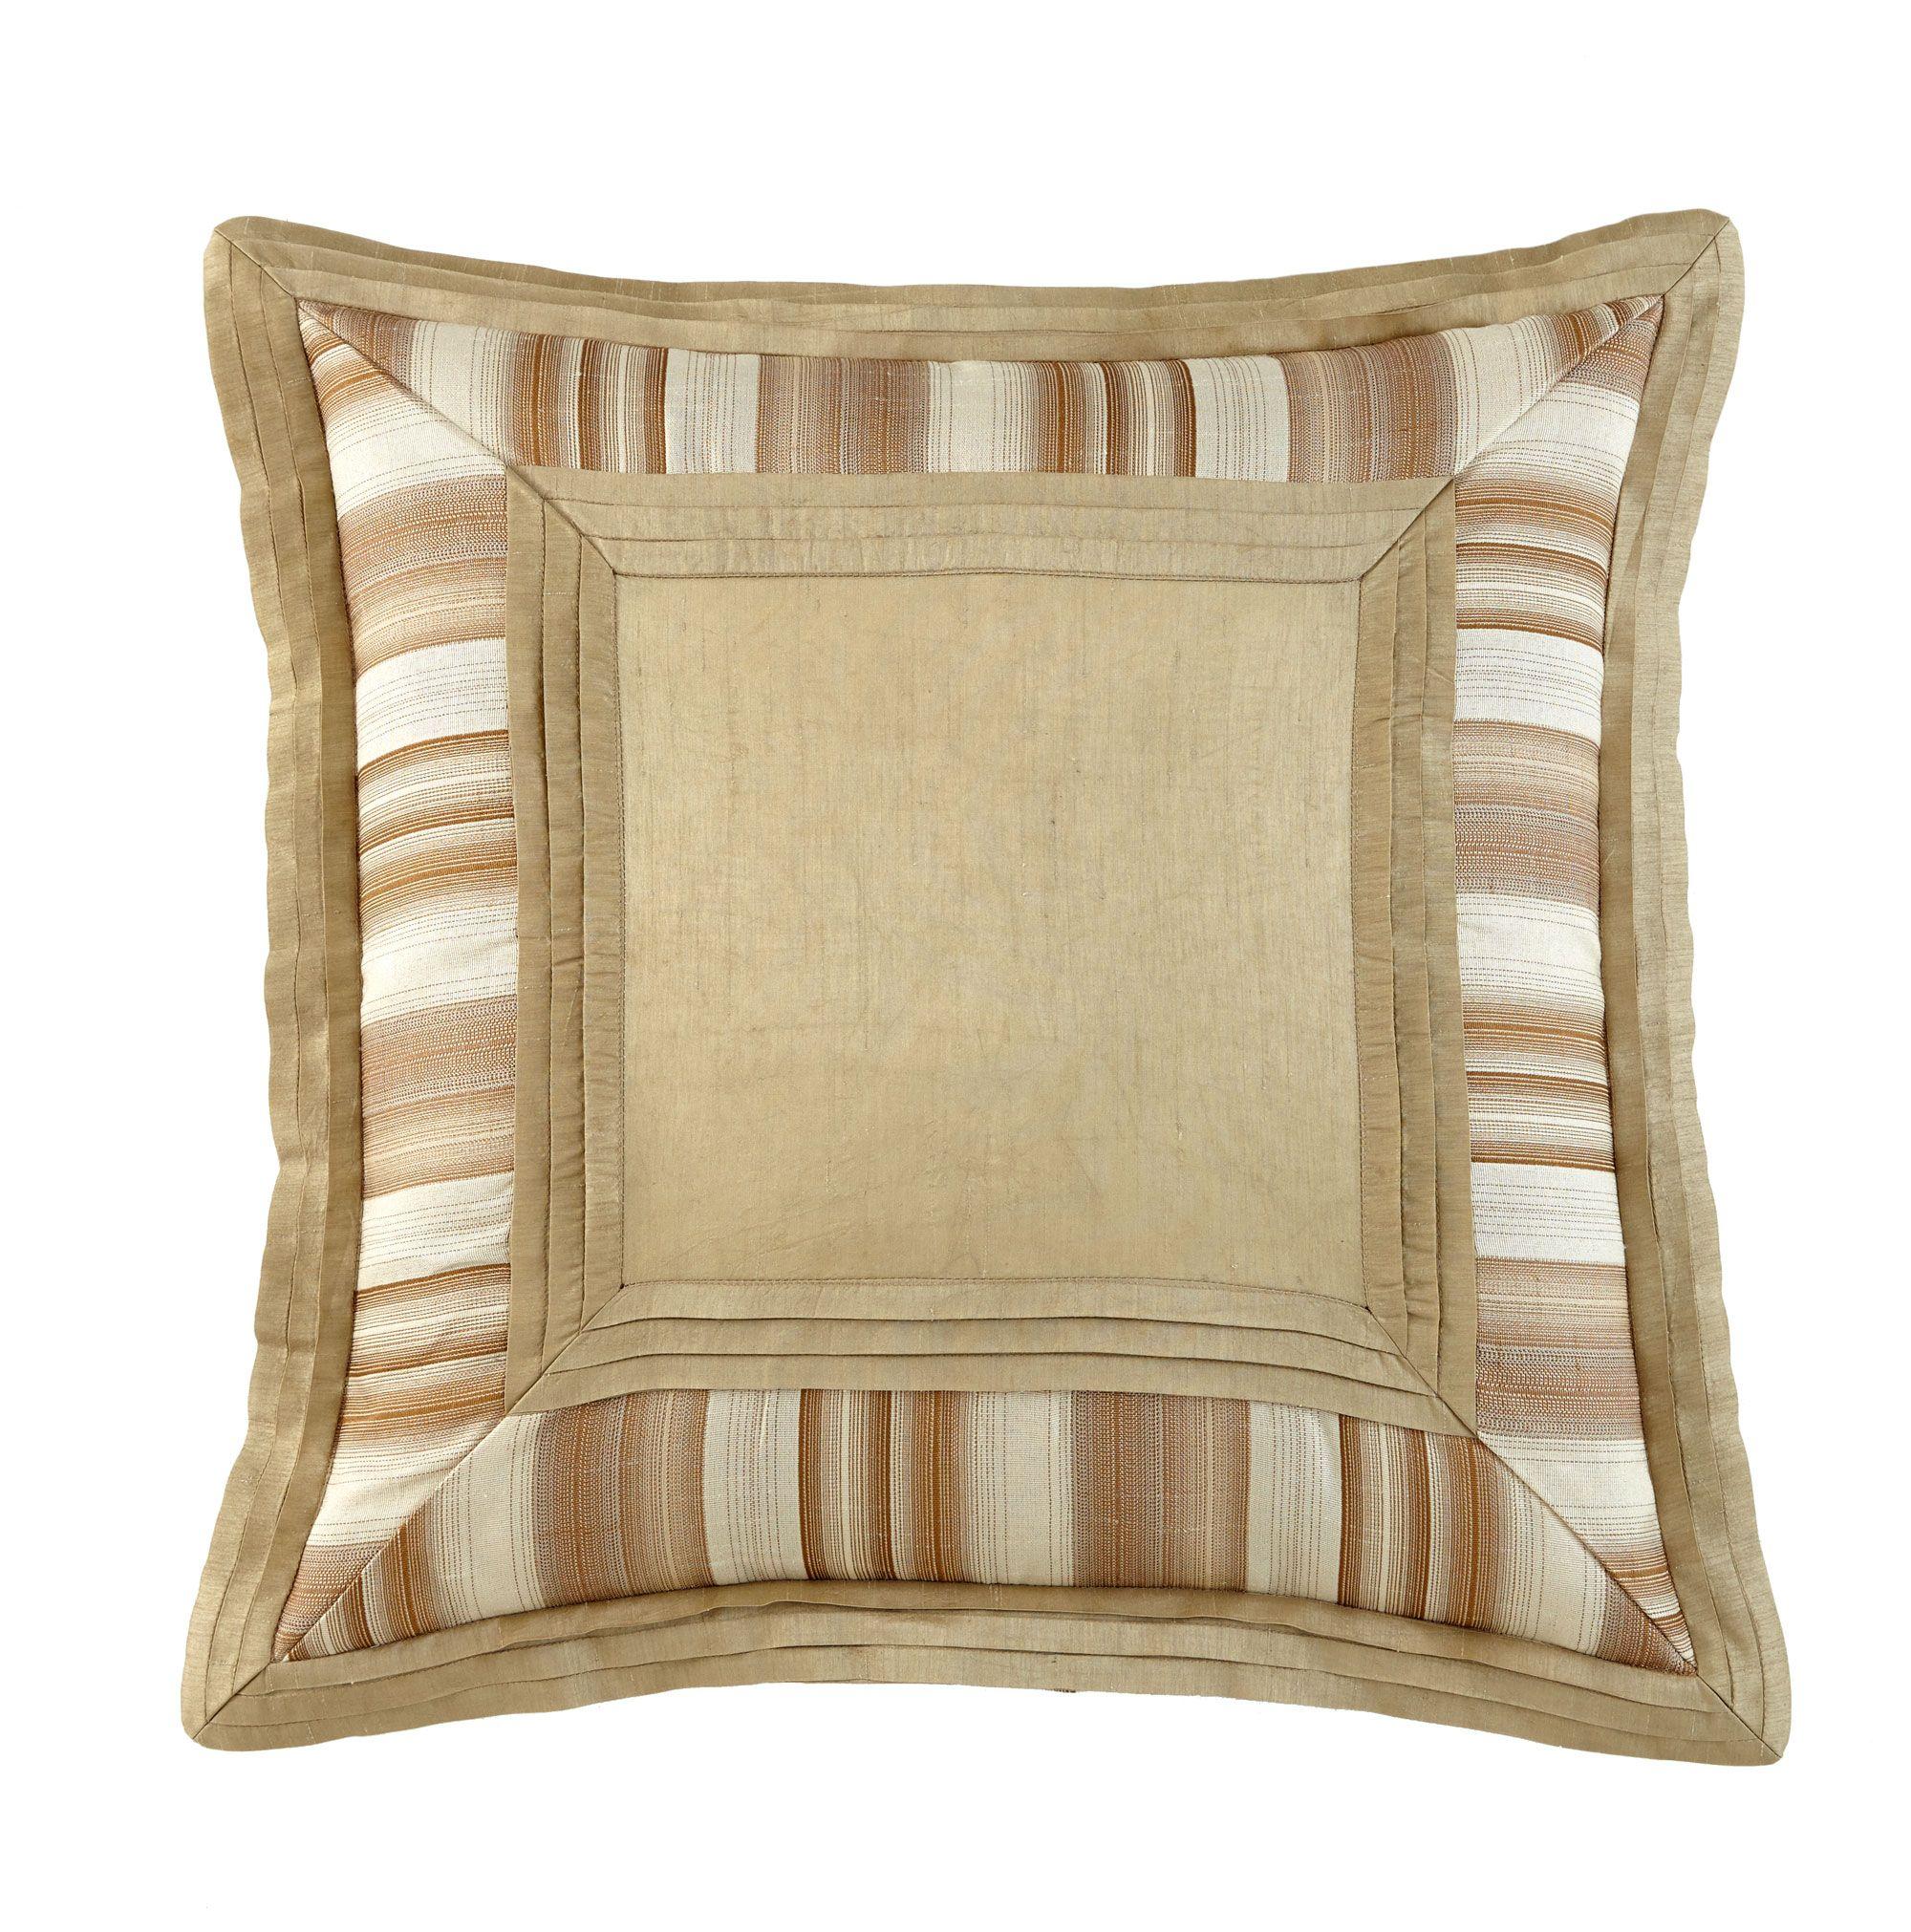 Decorative Pillows Pinterest : 20